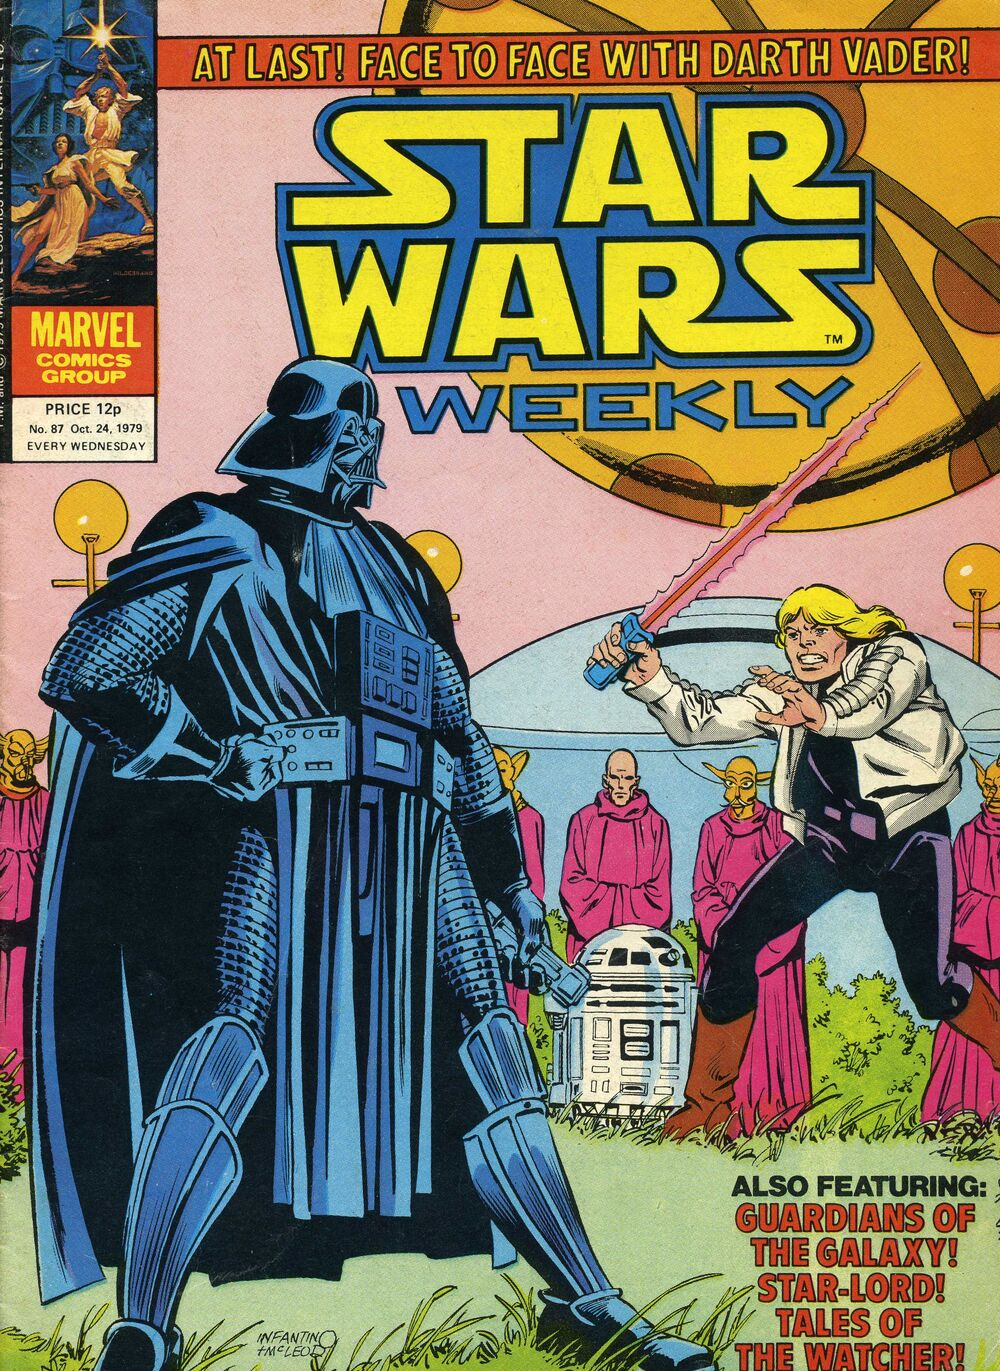 Star Wars Weekly 87